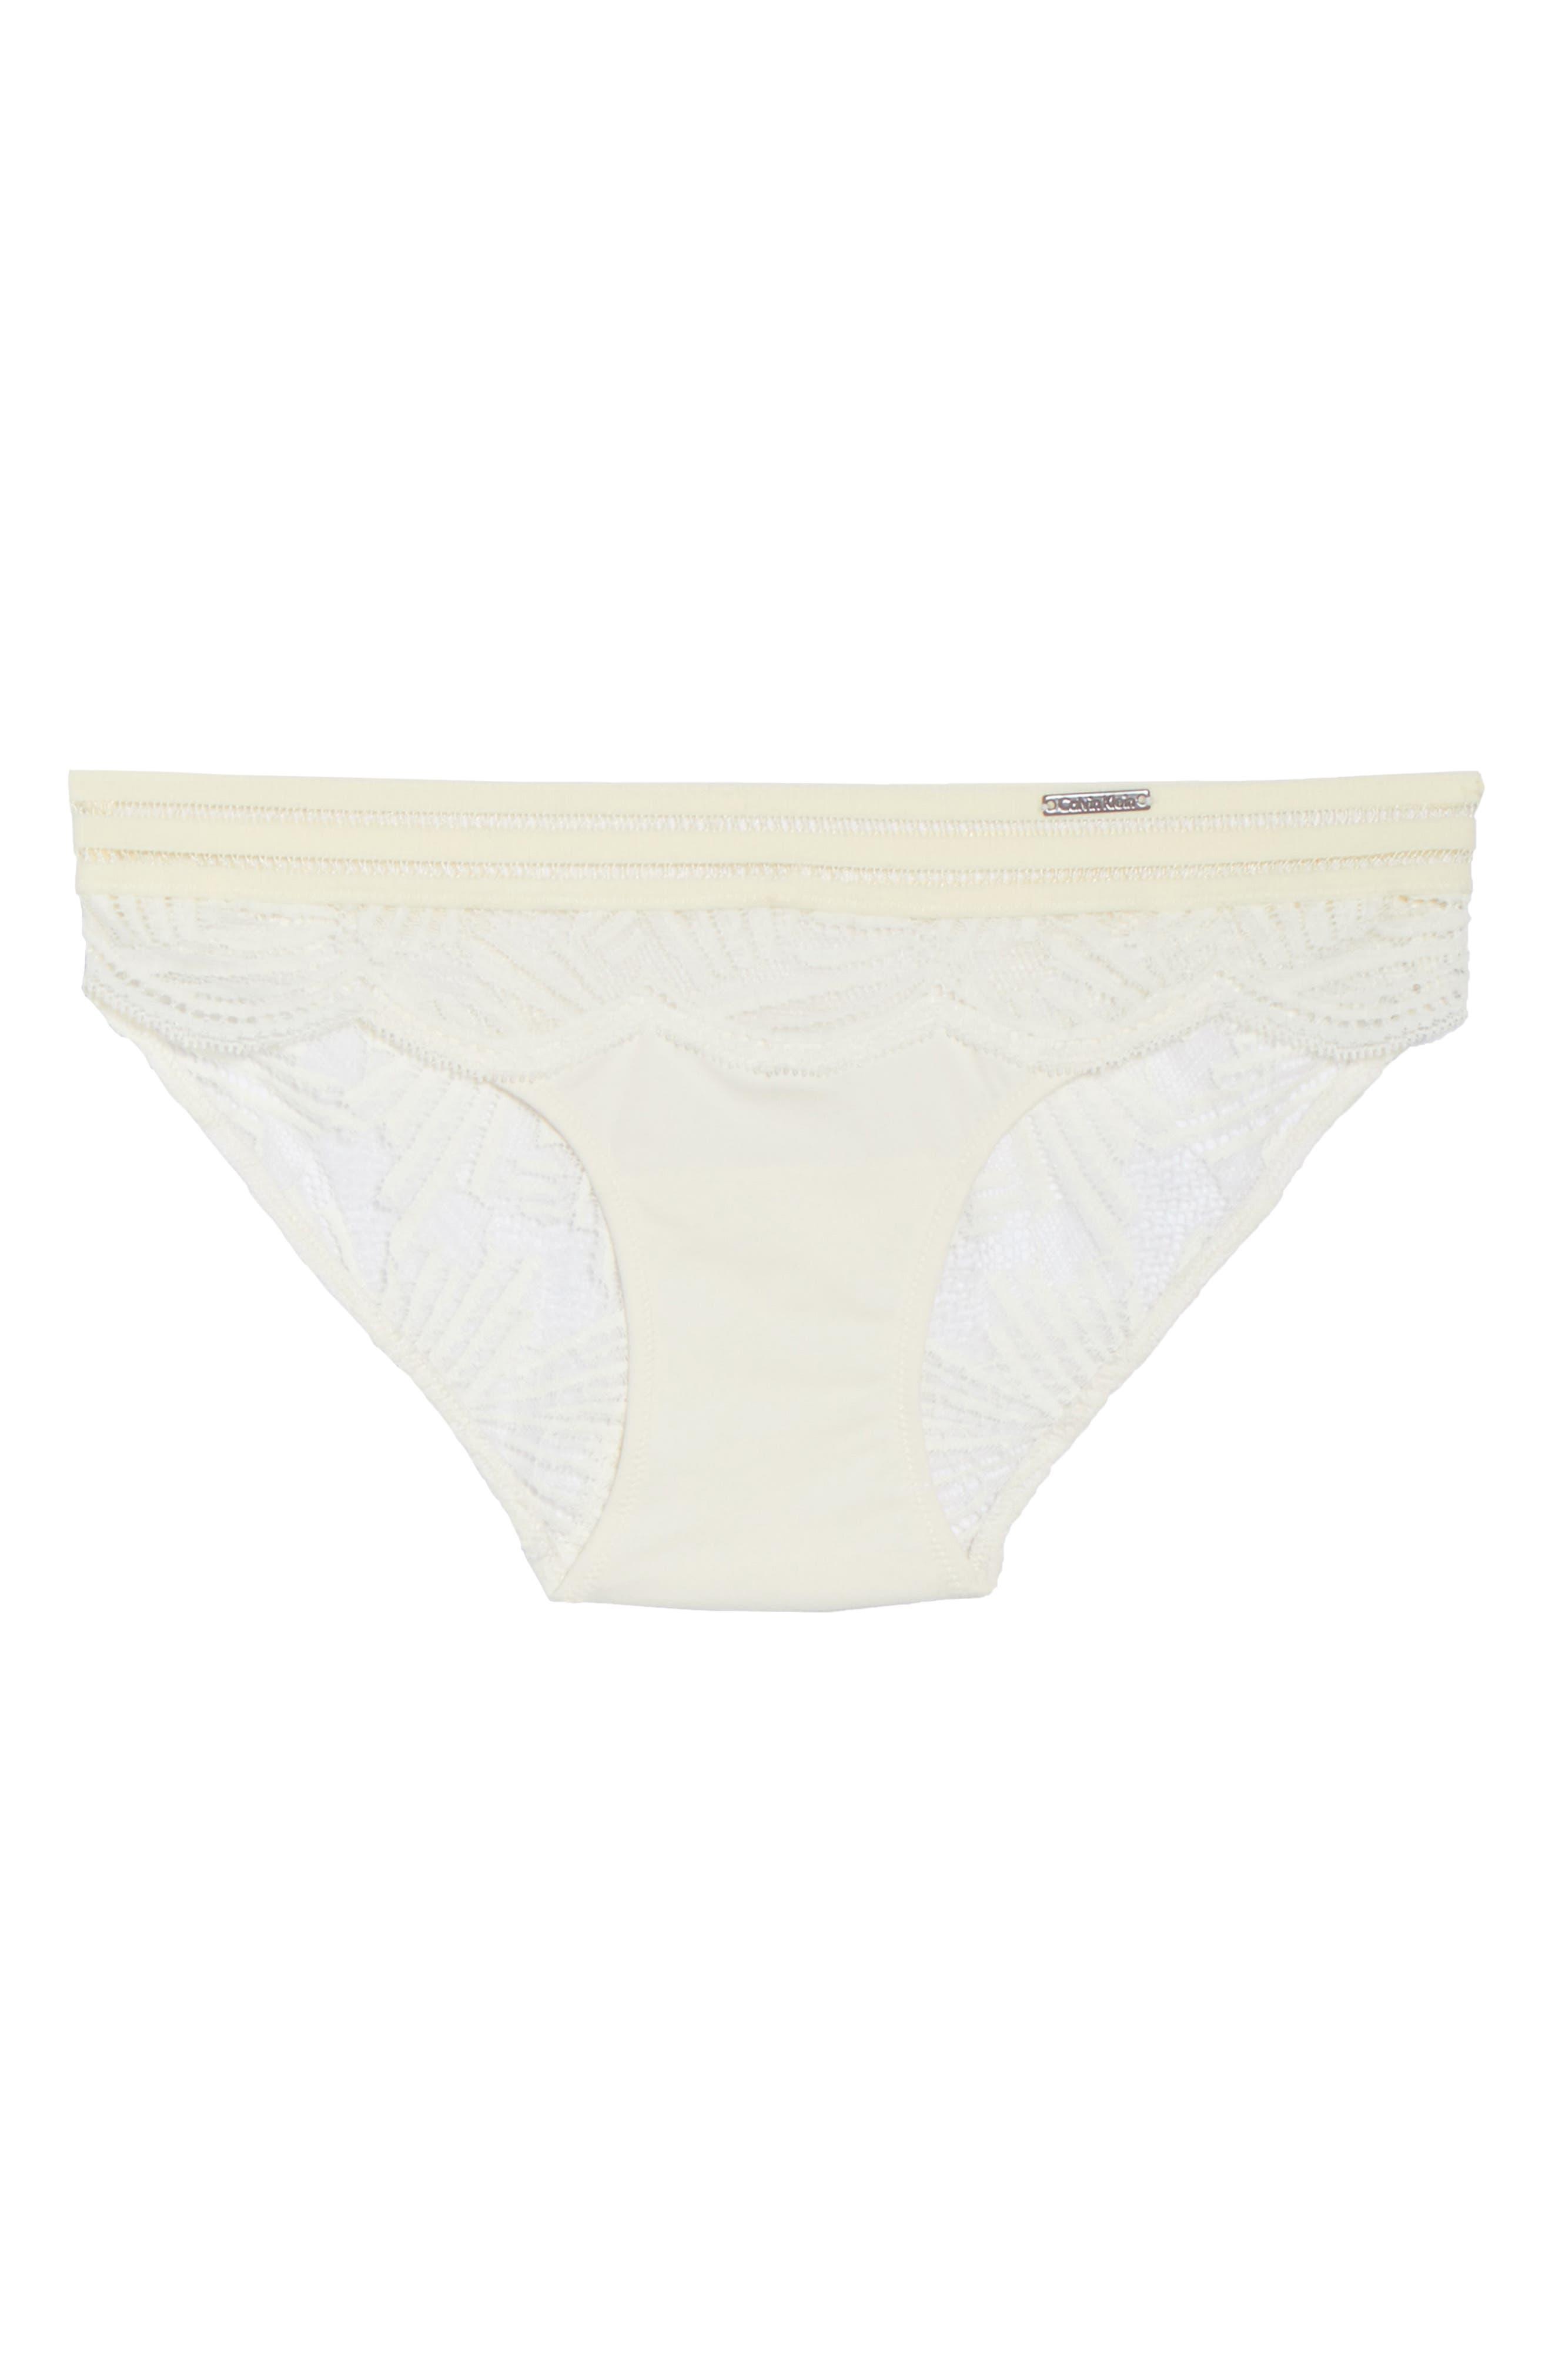 PF Slipcover Bikini,                             Alternate thumbnail 12, color,